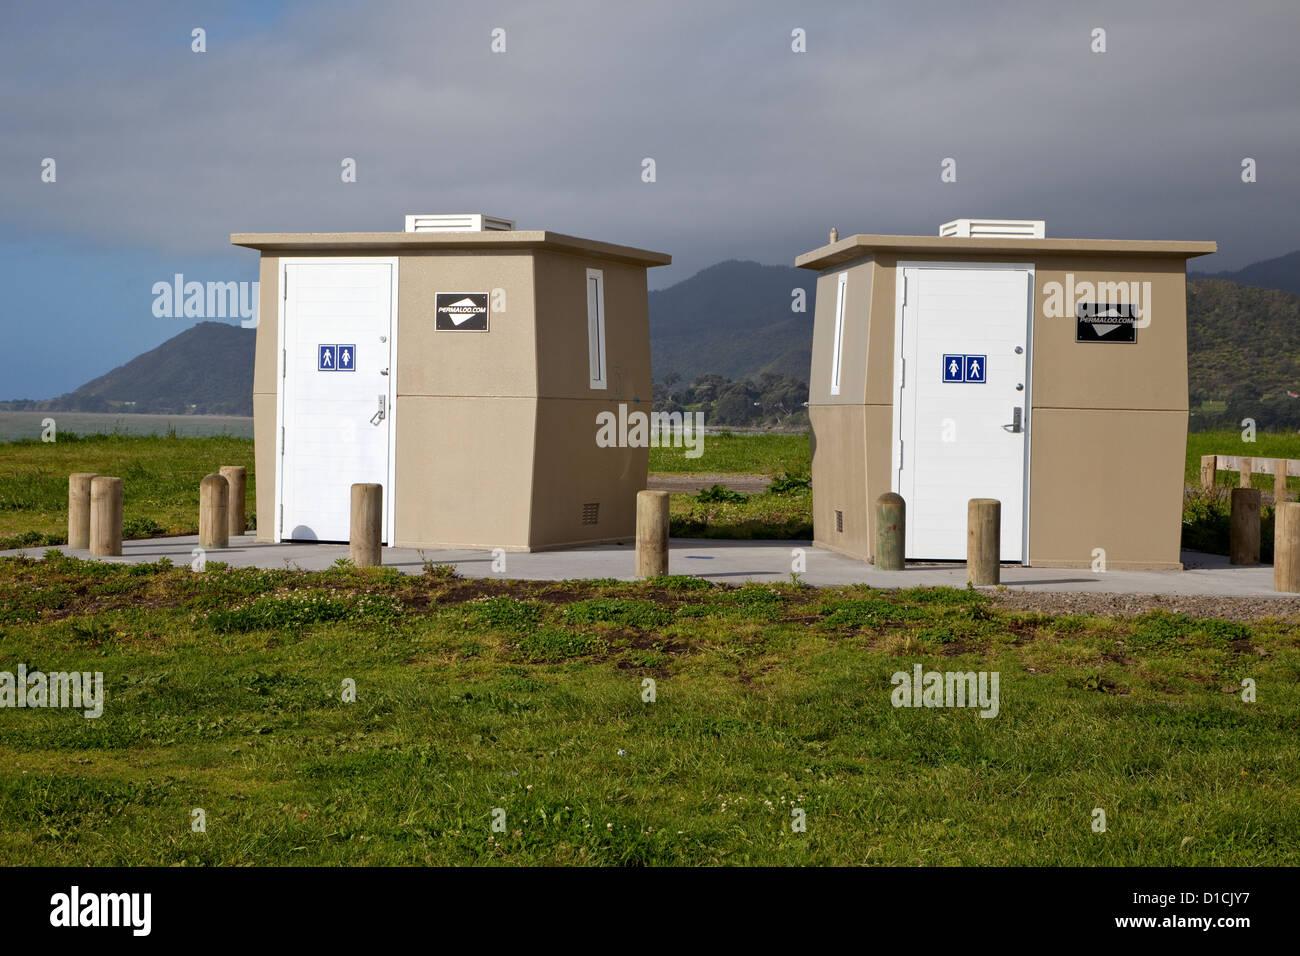 Public Restrooms, near Opotiki, Bay of Plenty, Highway 35. - Stock Image